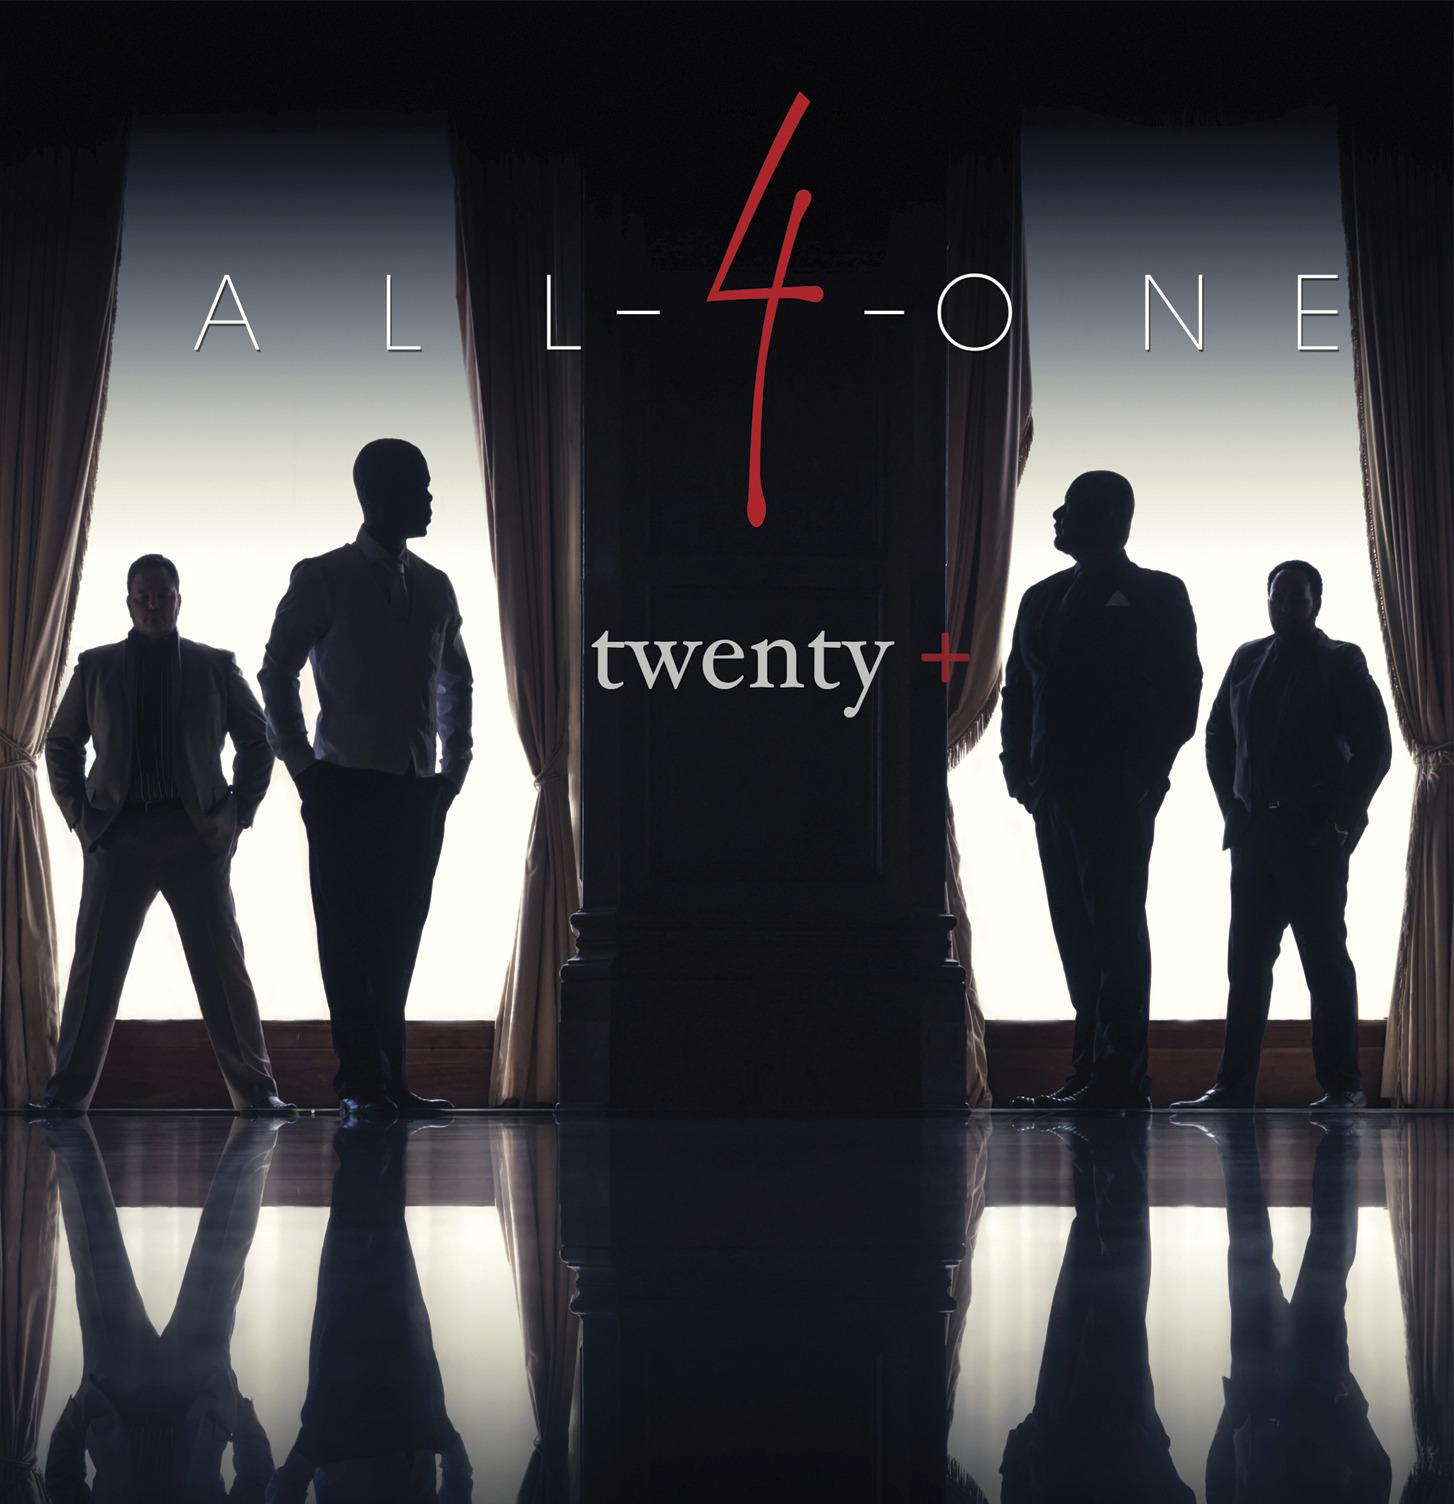 All-4-One-Twenty-Plus-Album-Cover.jpg